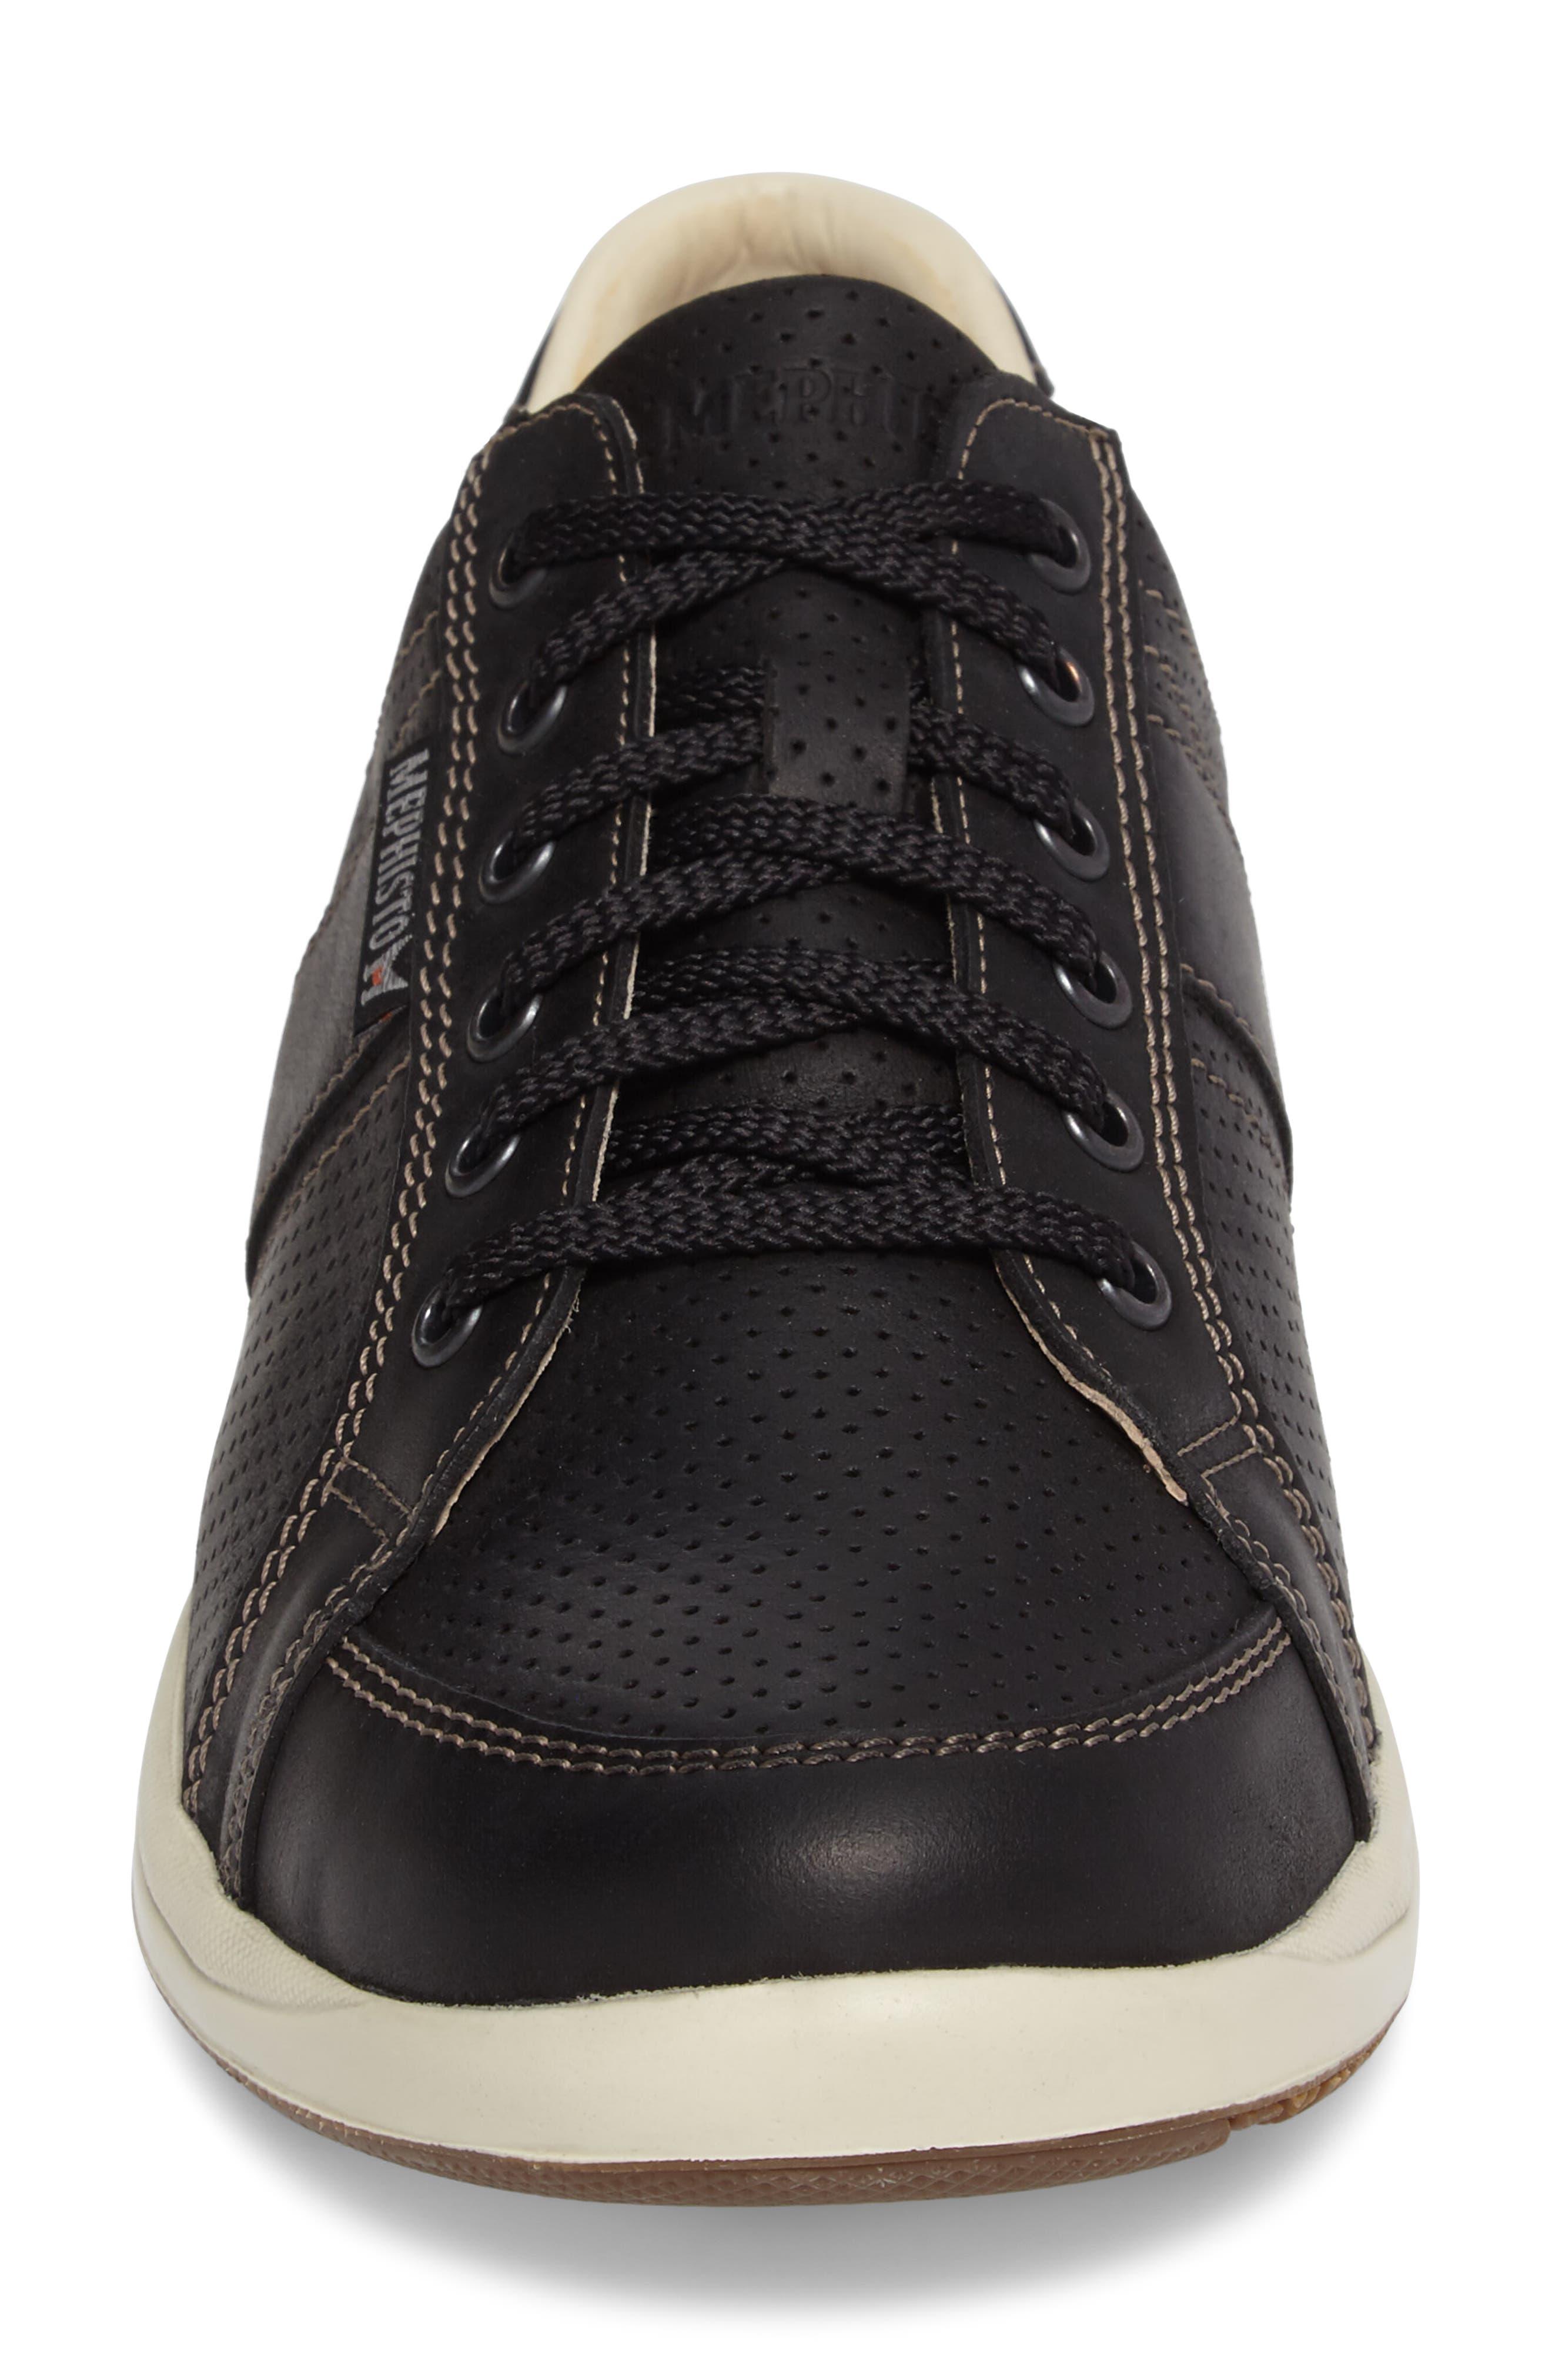 'Hero' Perforated Sneaker,                             Alternate thumbnail 4, color,                             Black Nubuck Leather